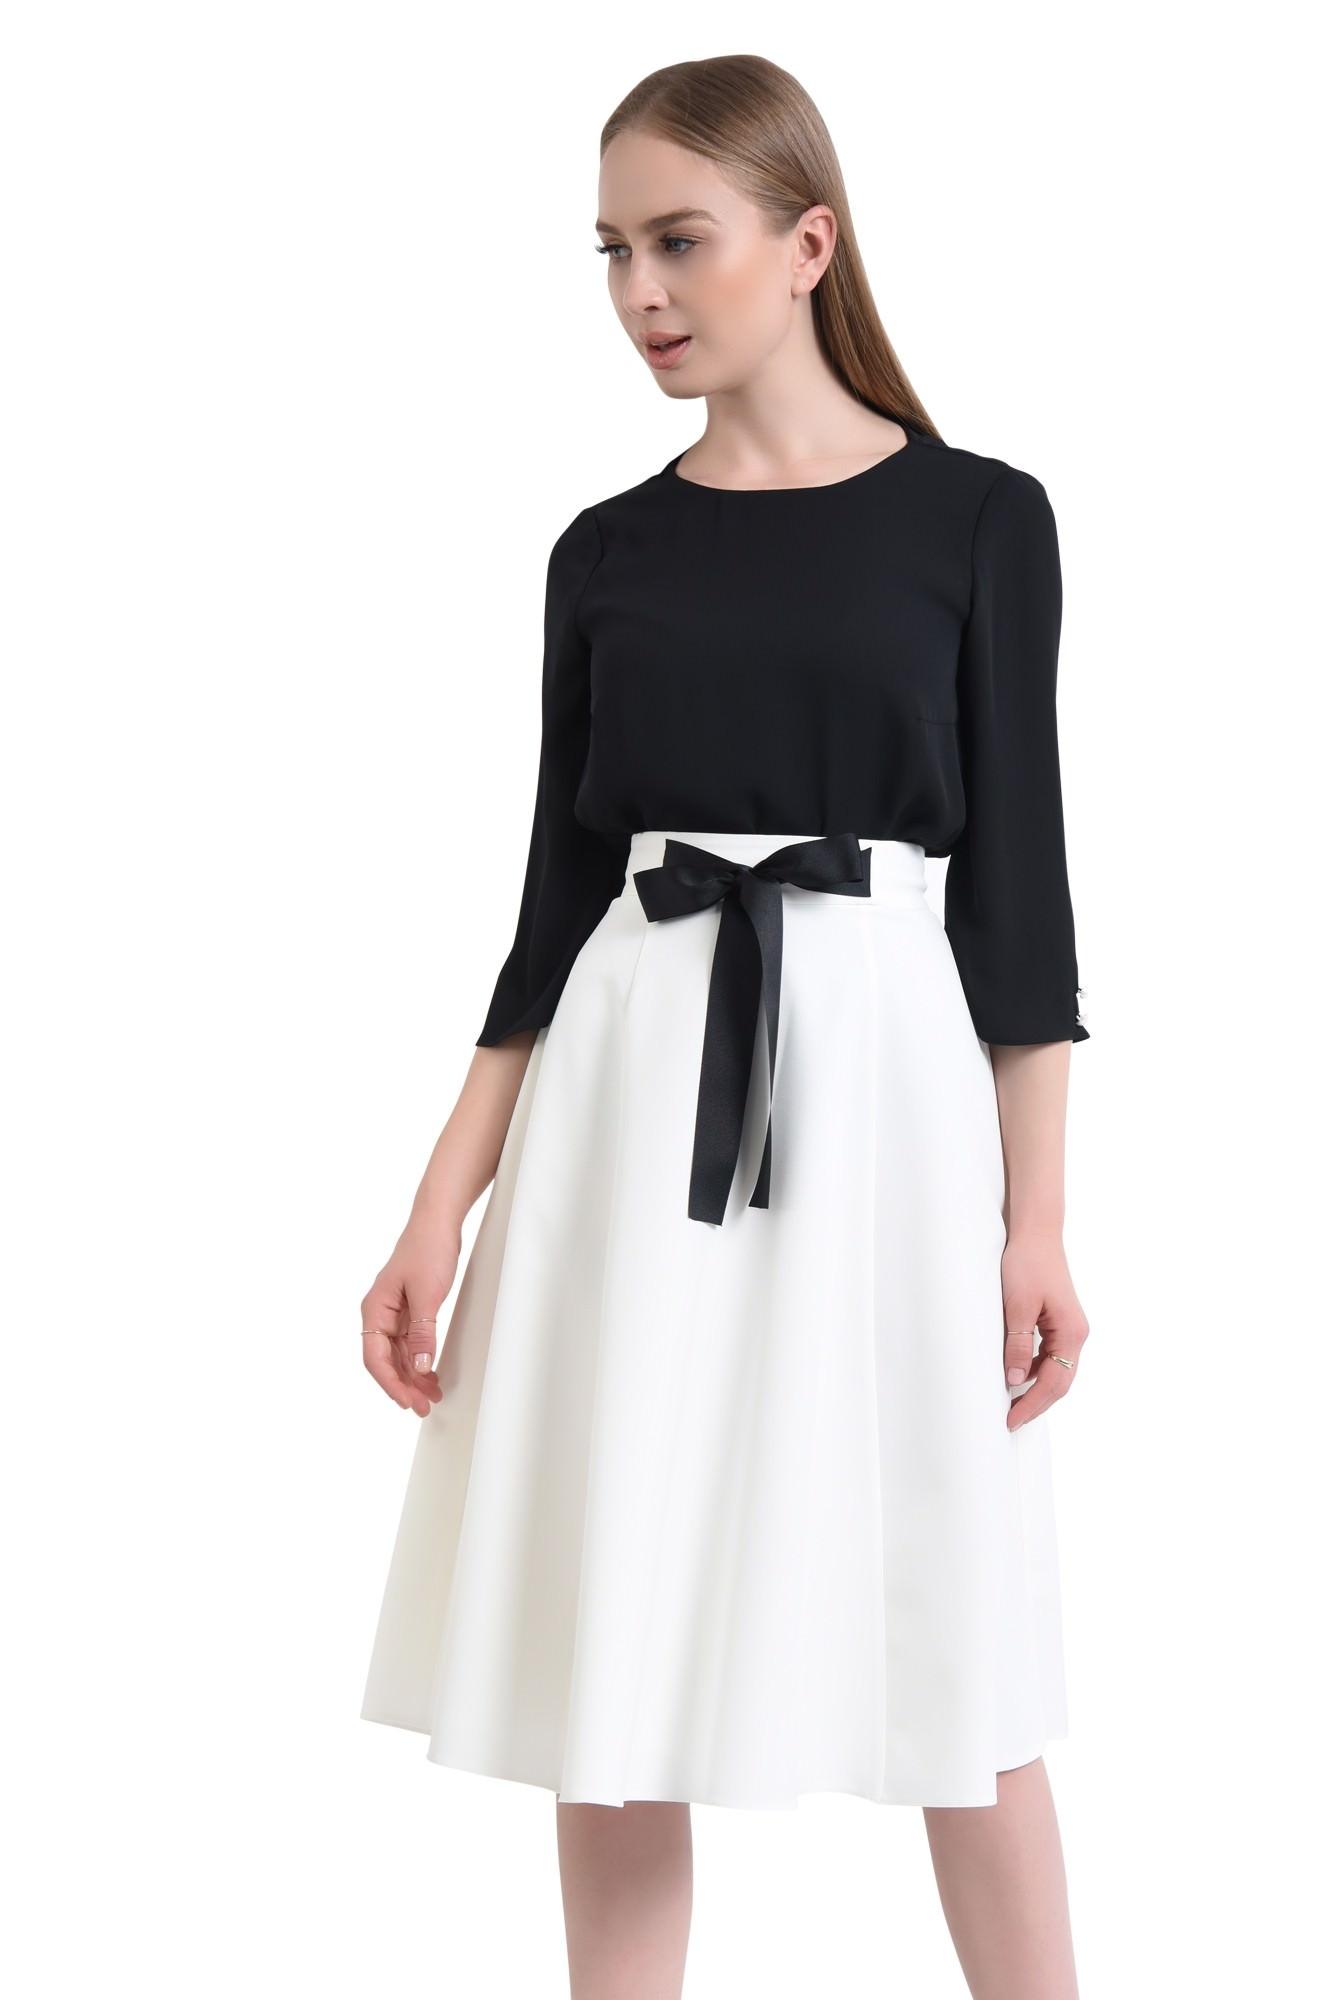 Fusta eleganta, funda, contrast alb-negru